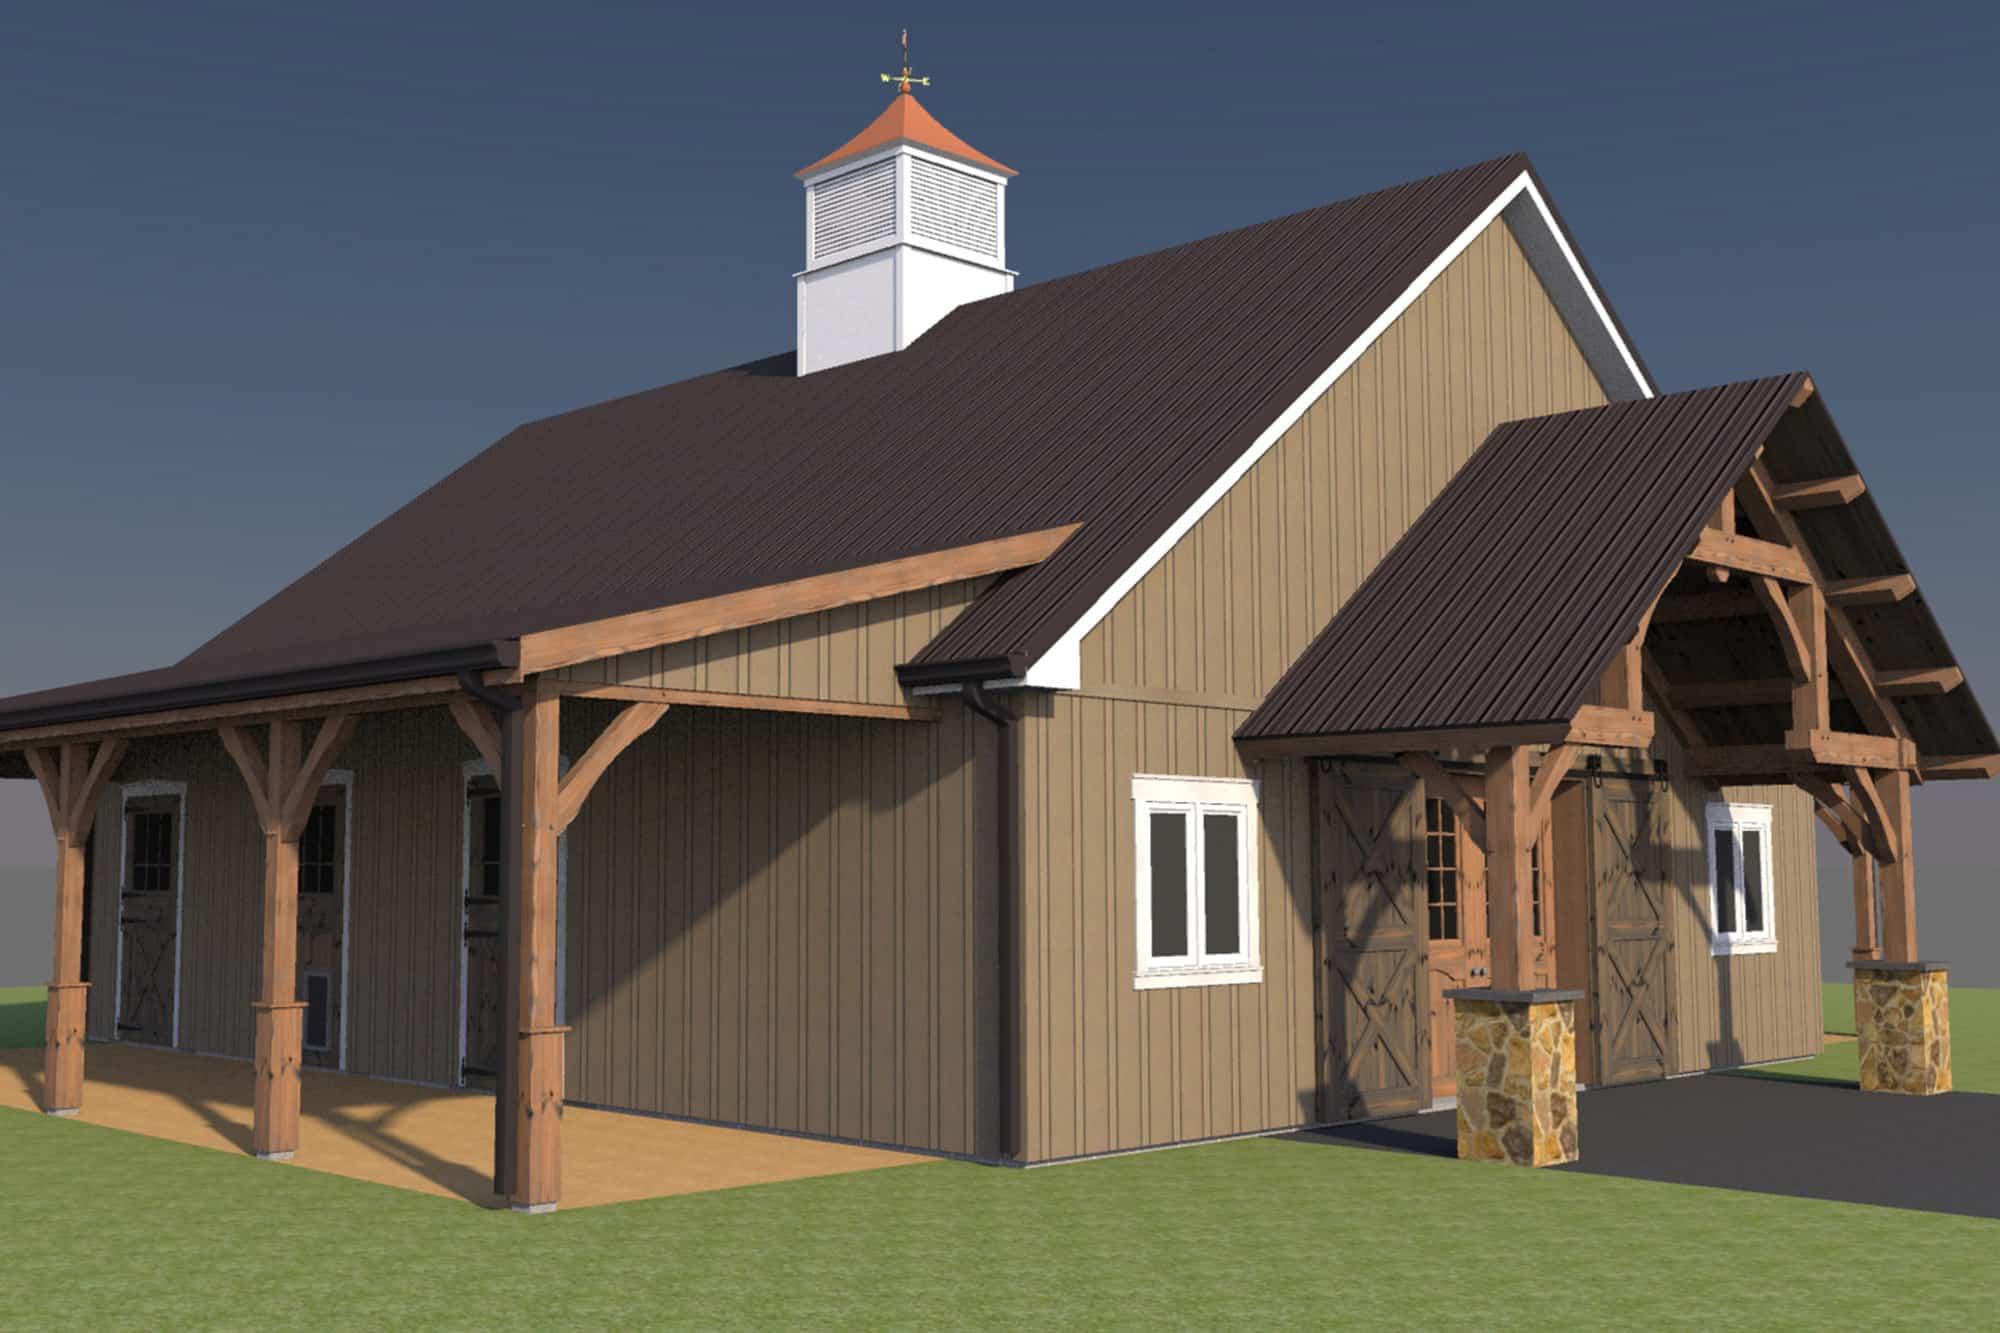 party barn cupola grand entryway